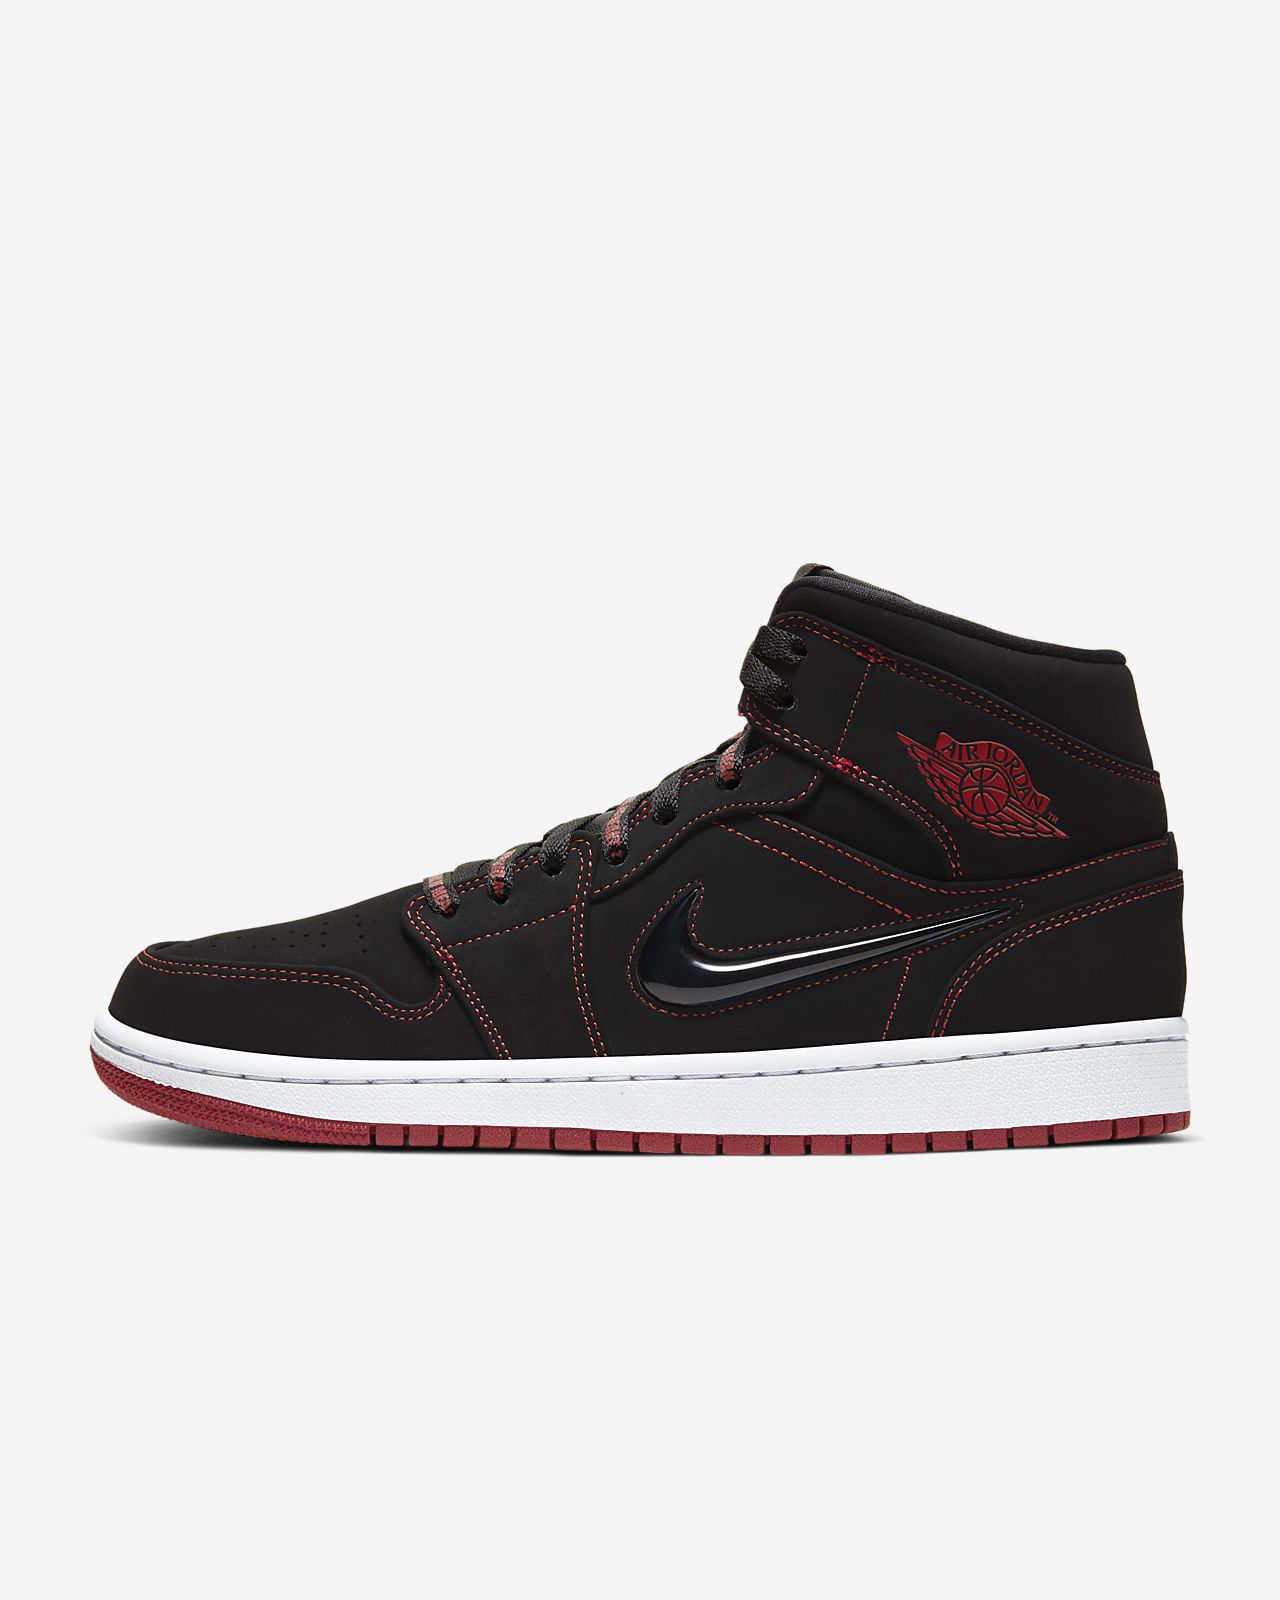 Nike Air Jordan 1 Mid Herren Sneaker Turnschuhe Sportschuhe